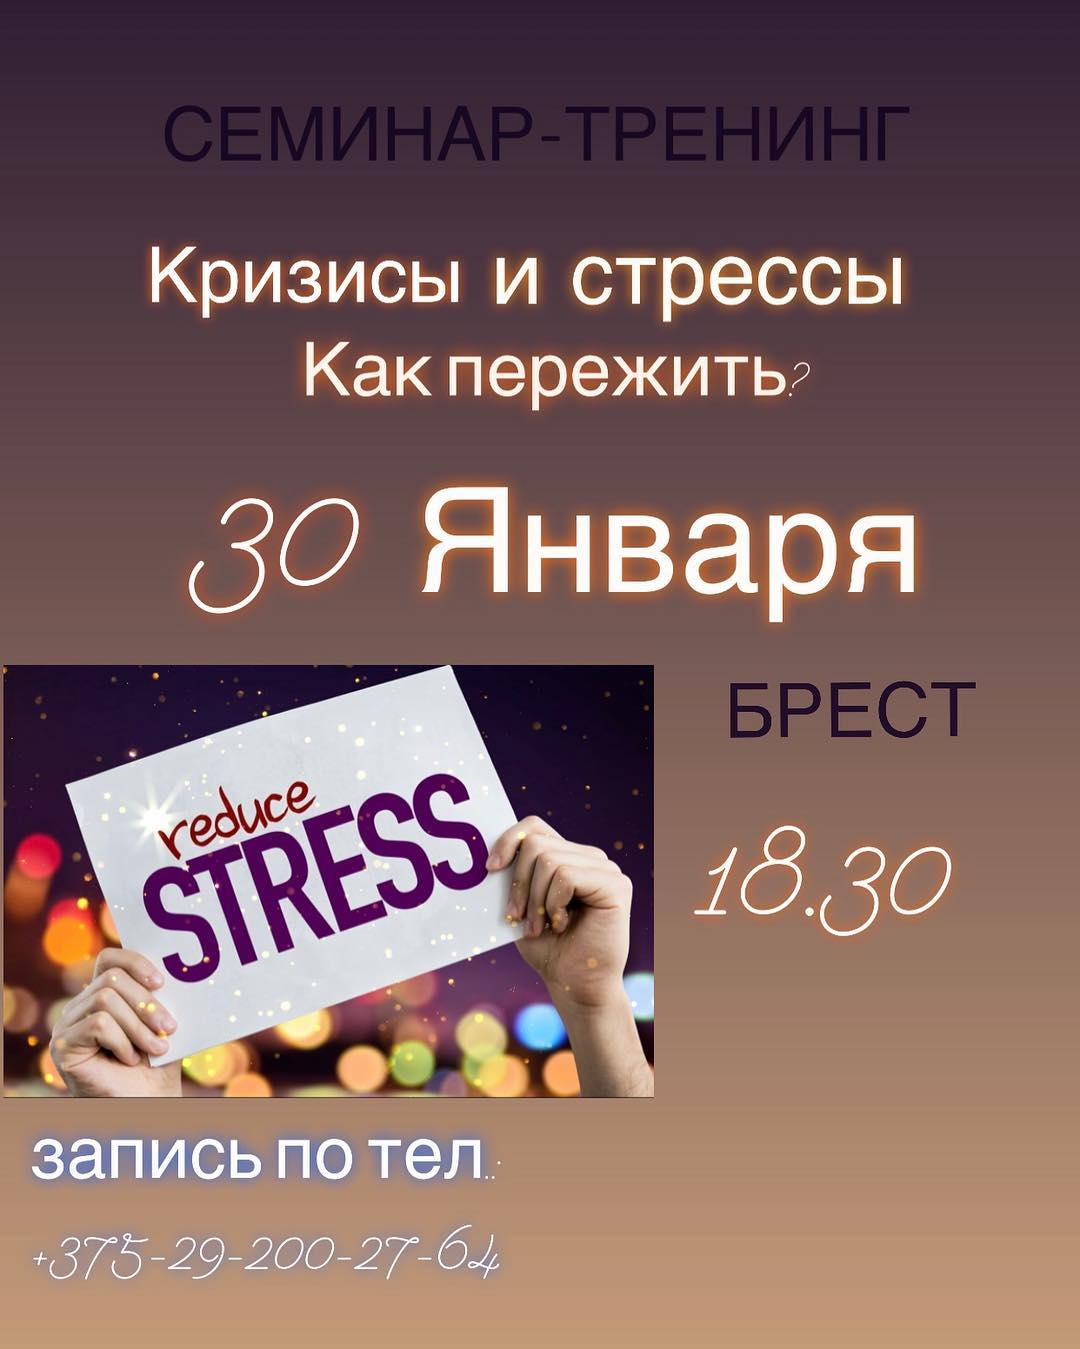 Брест, кризис, стресс